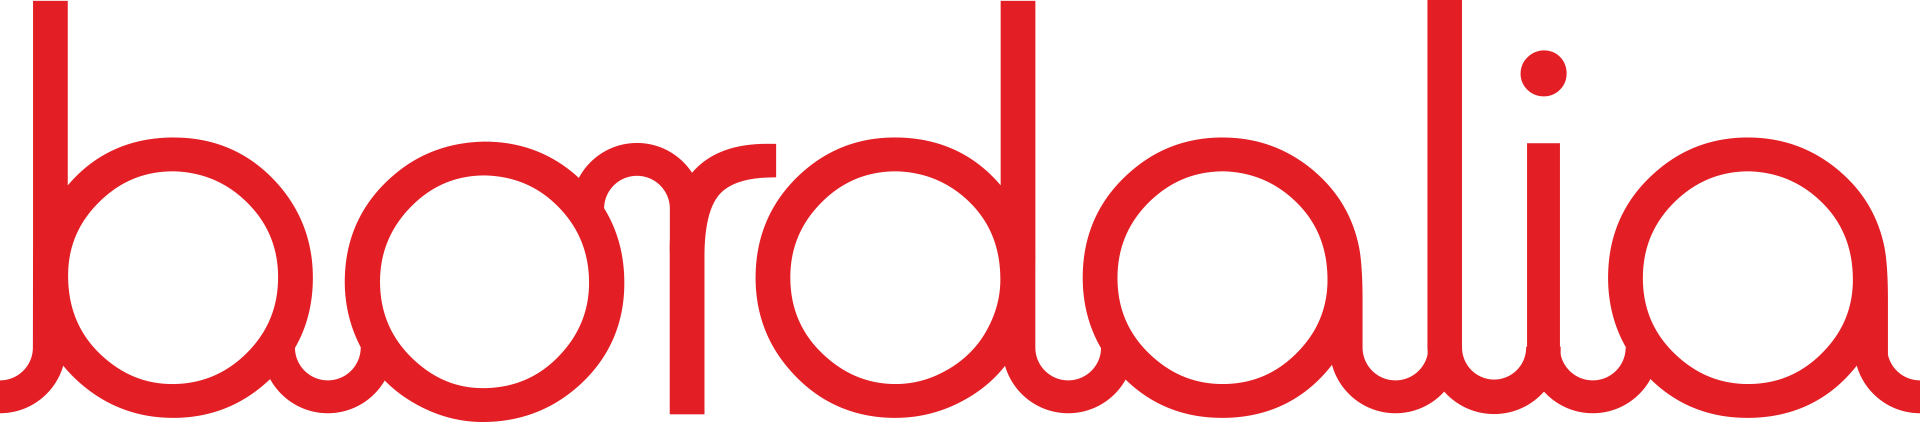 bordalia logo